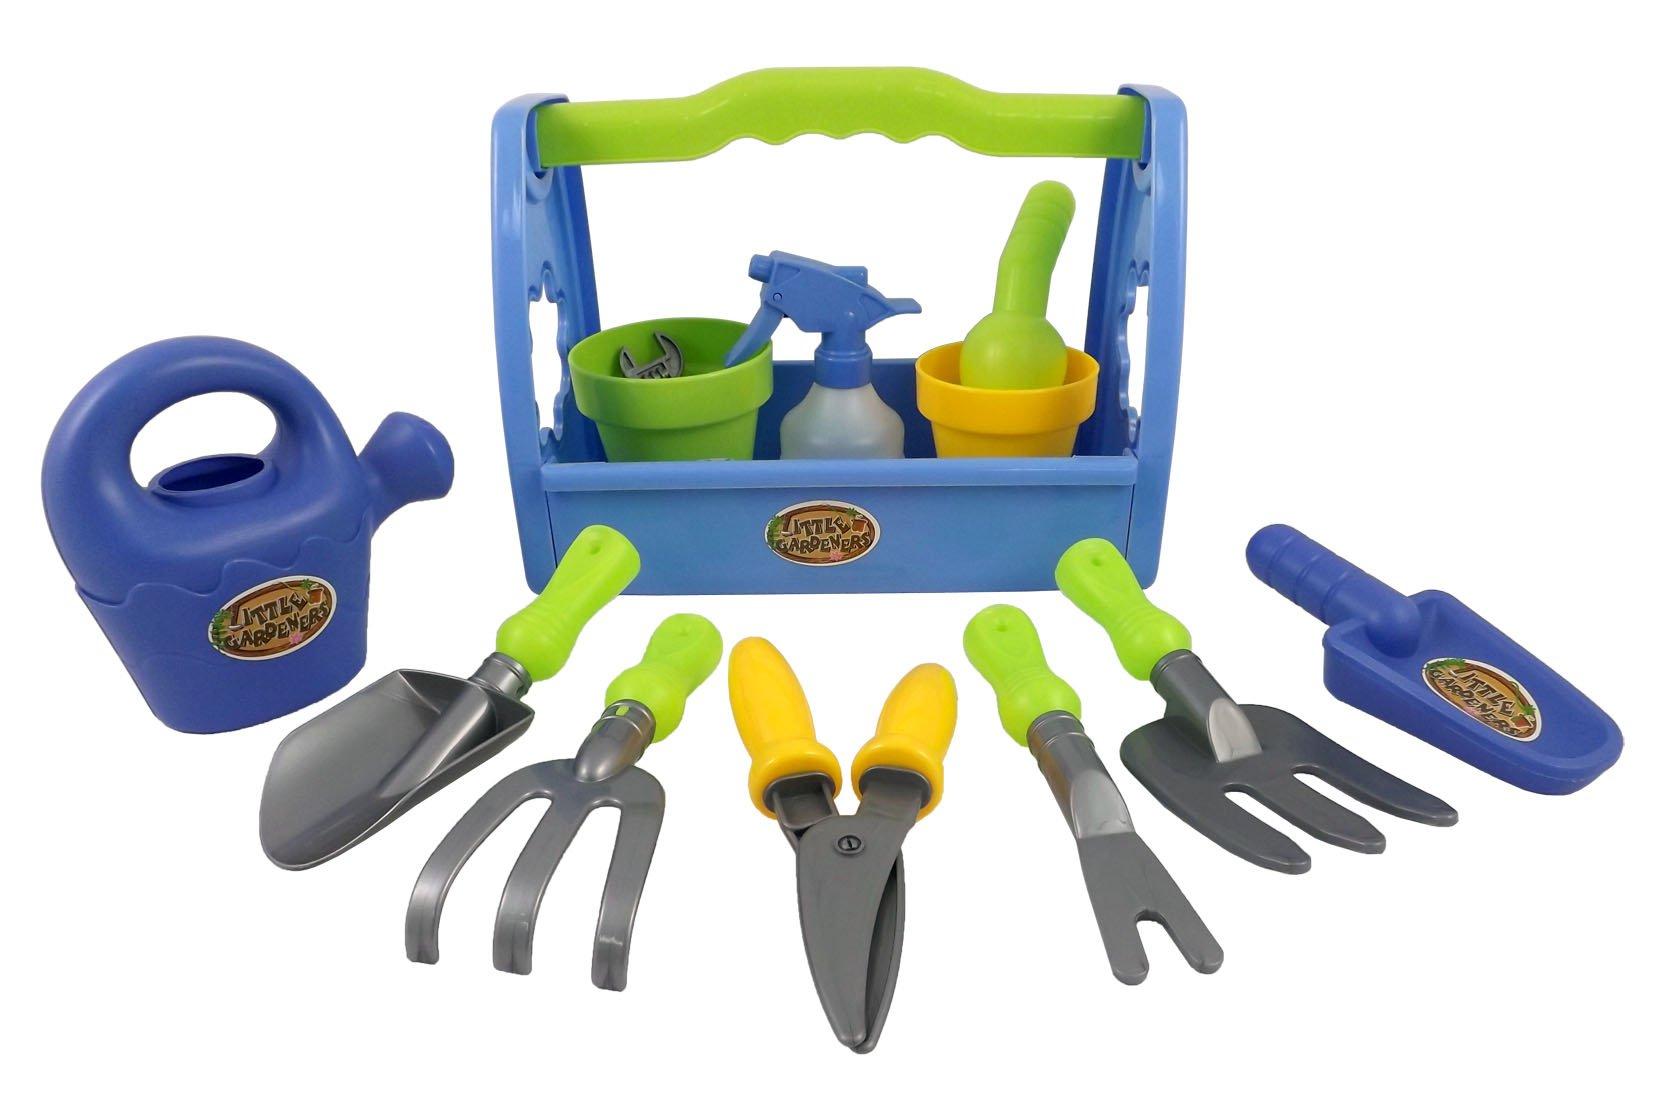 Liberty Imports Little Garden Tool Box 14pc Toy Gardening Tools Set Kids